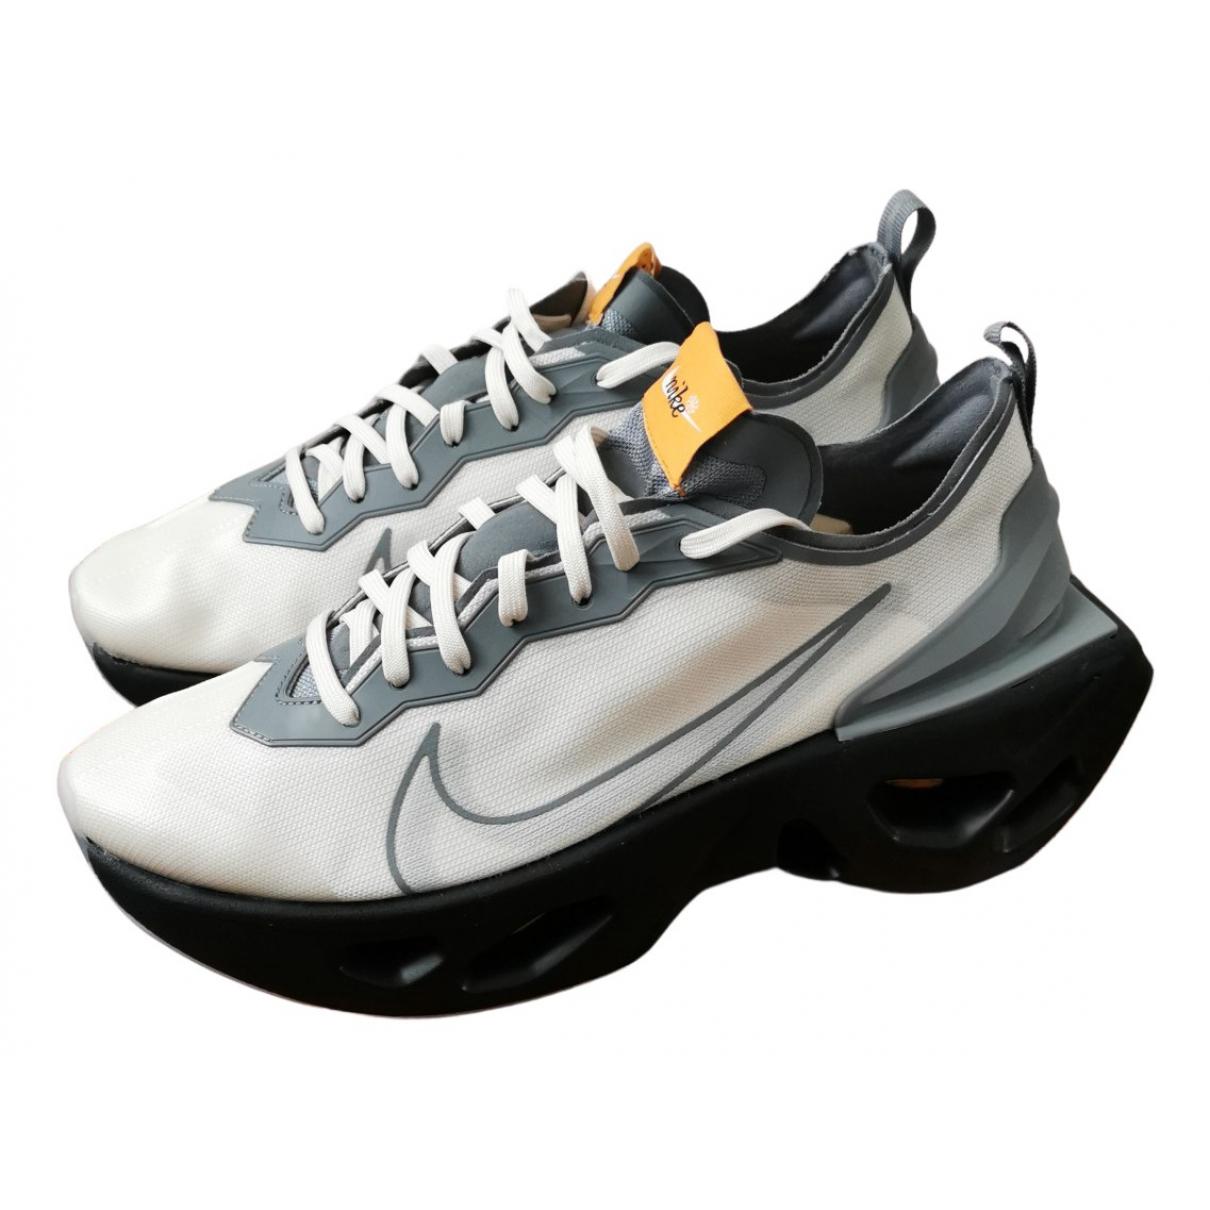 Nike Zoom X Vista Grind Sneakers in  Ecru Leinen